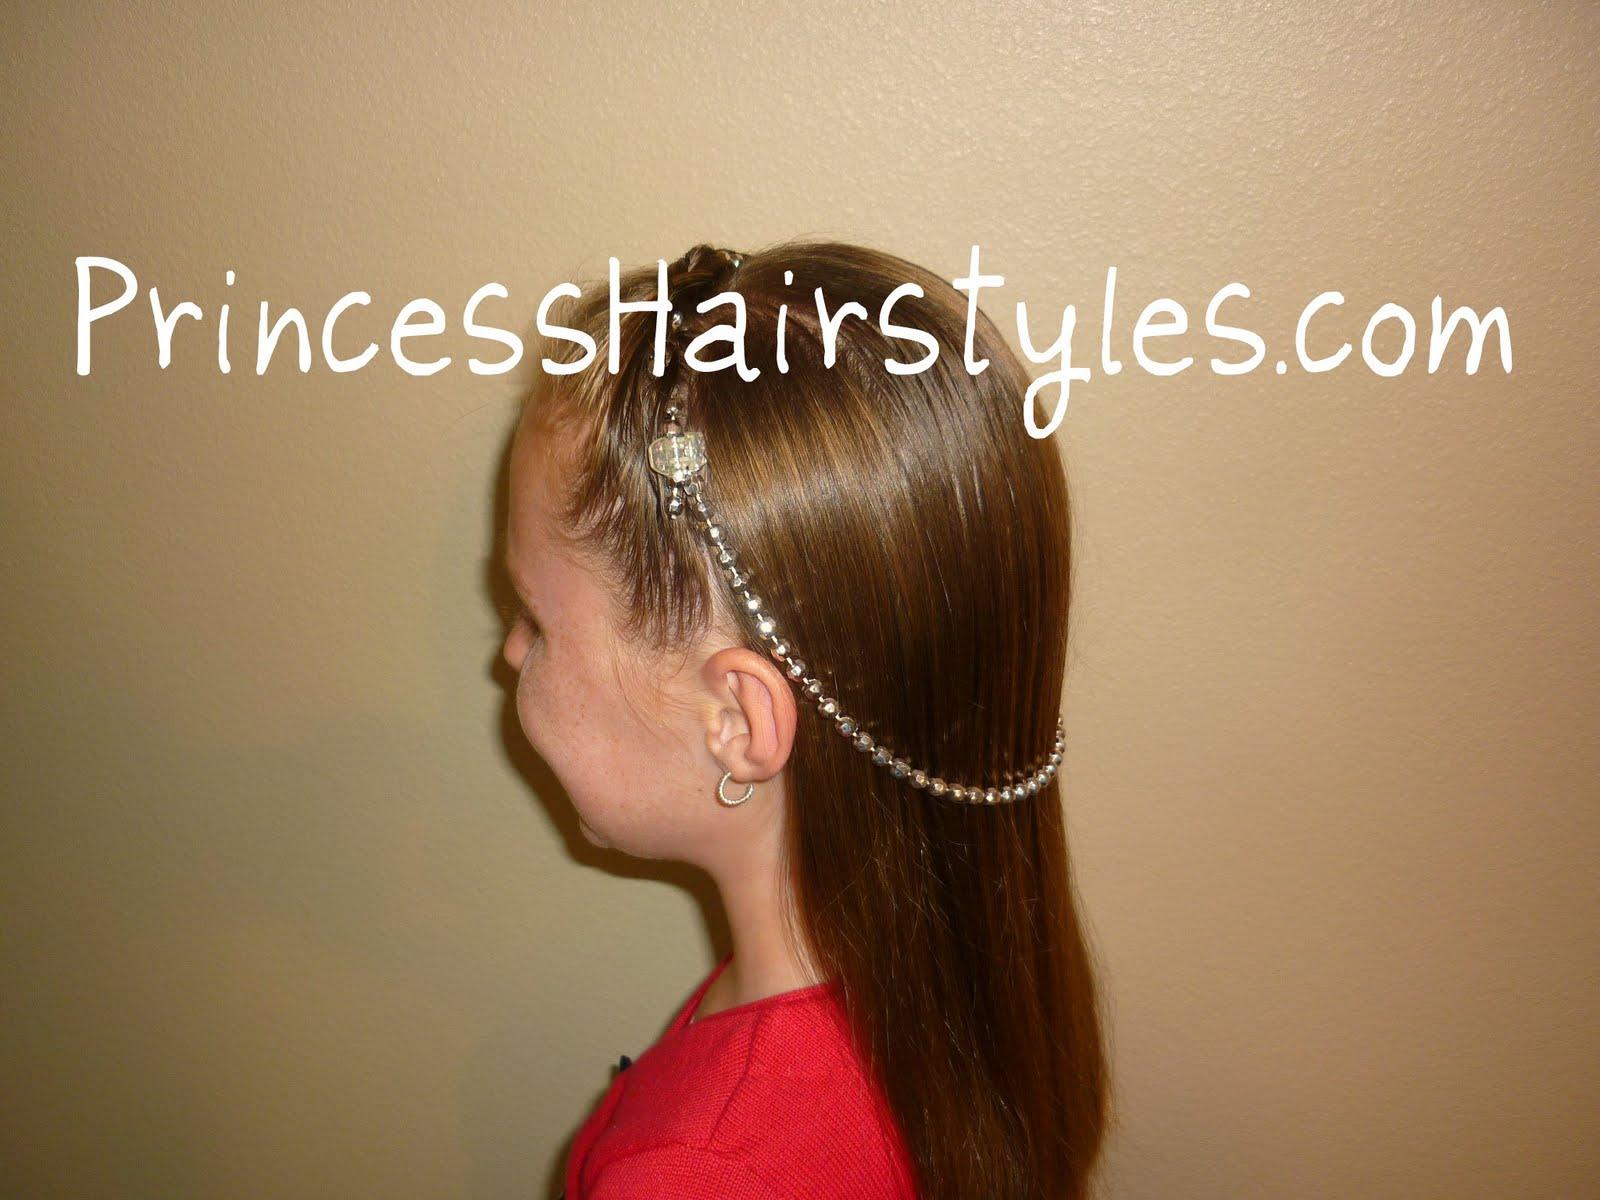 Halloween Hair Styles: Halloween Hairstyles, Princess Braided Headband With